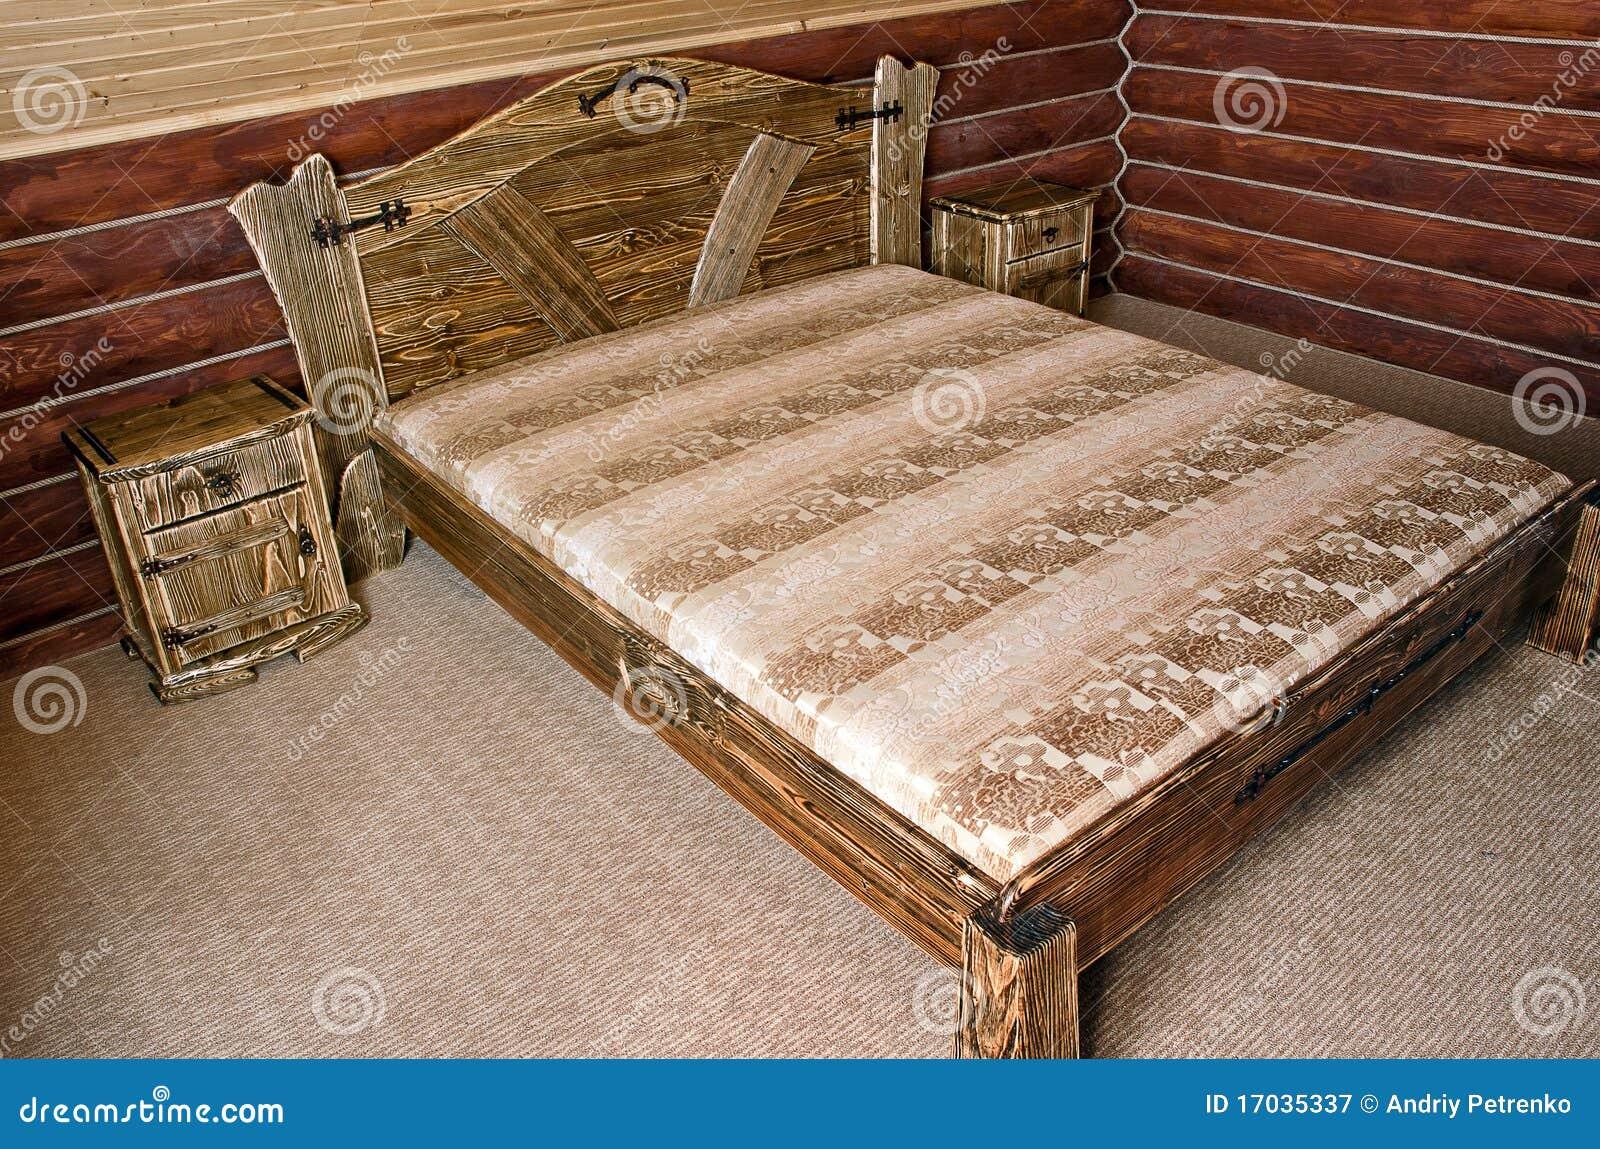 Ouderwetse slaapkamer : Slaapkamer Met Ouderwets Houten Bed Royalty ...